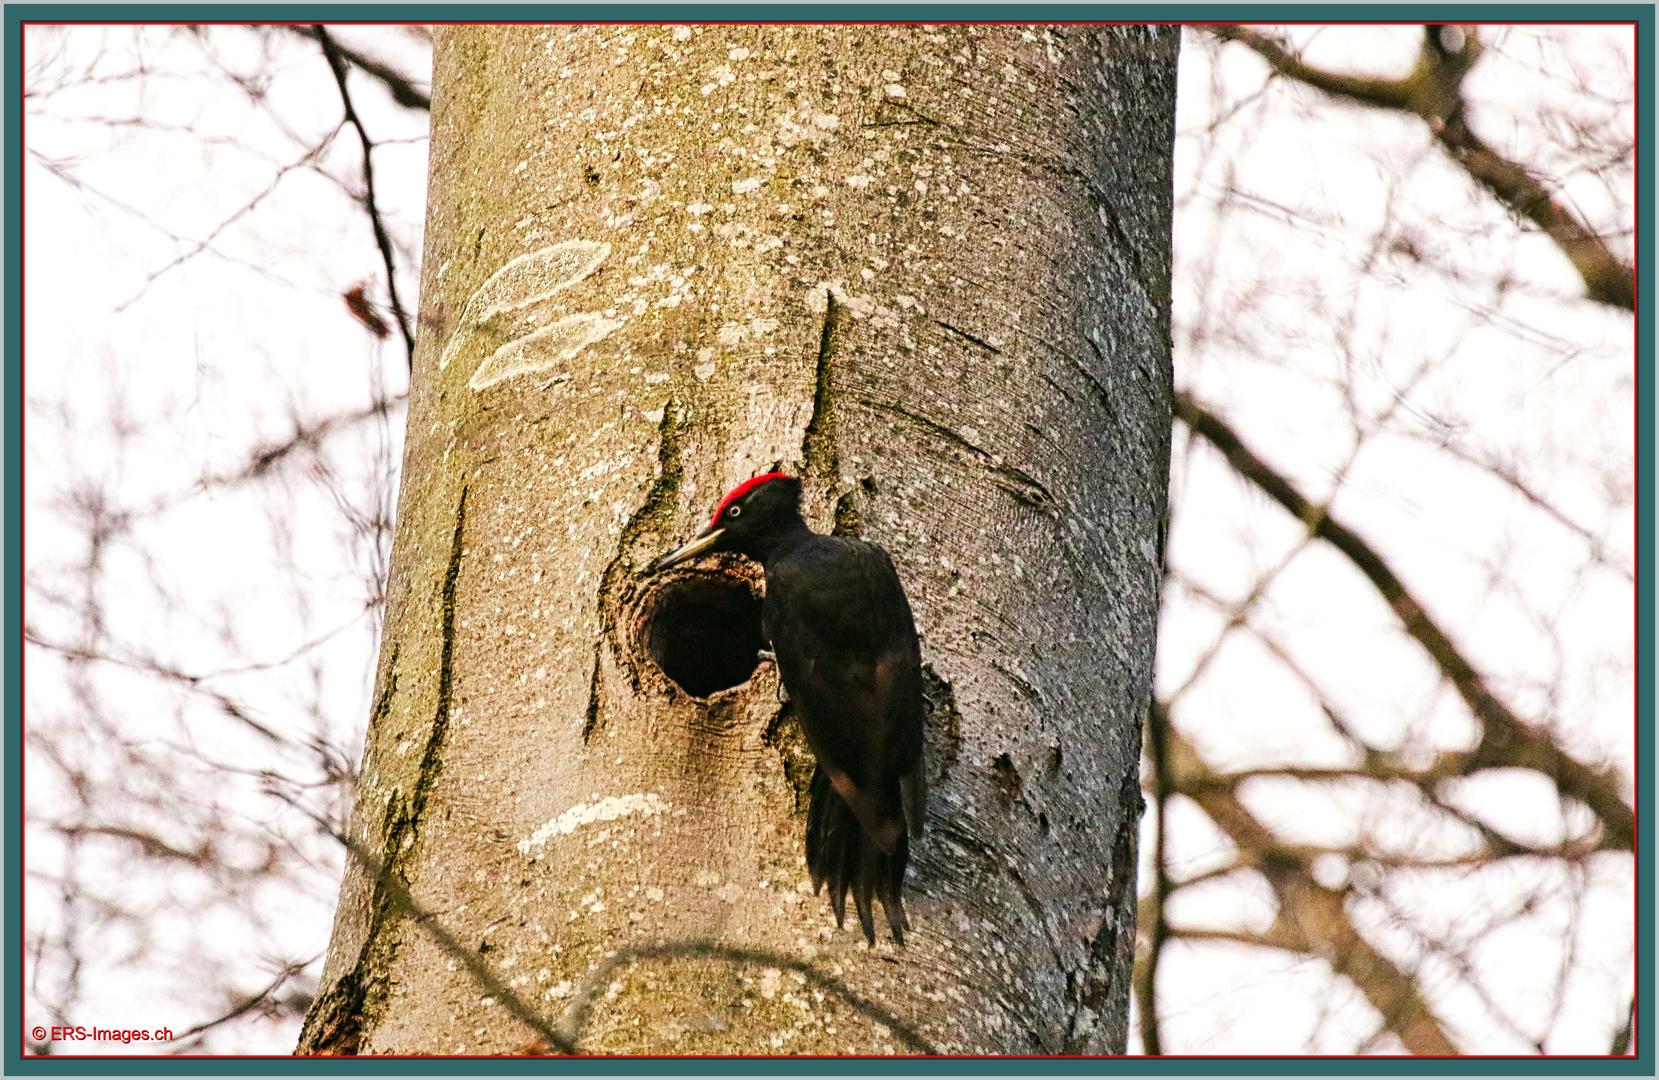 Schwarzspecht Dryocopus martius 2020-02-14 028  Pic noir ©